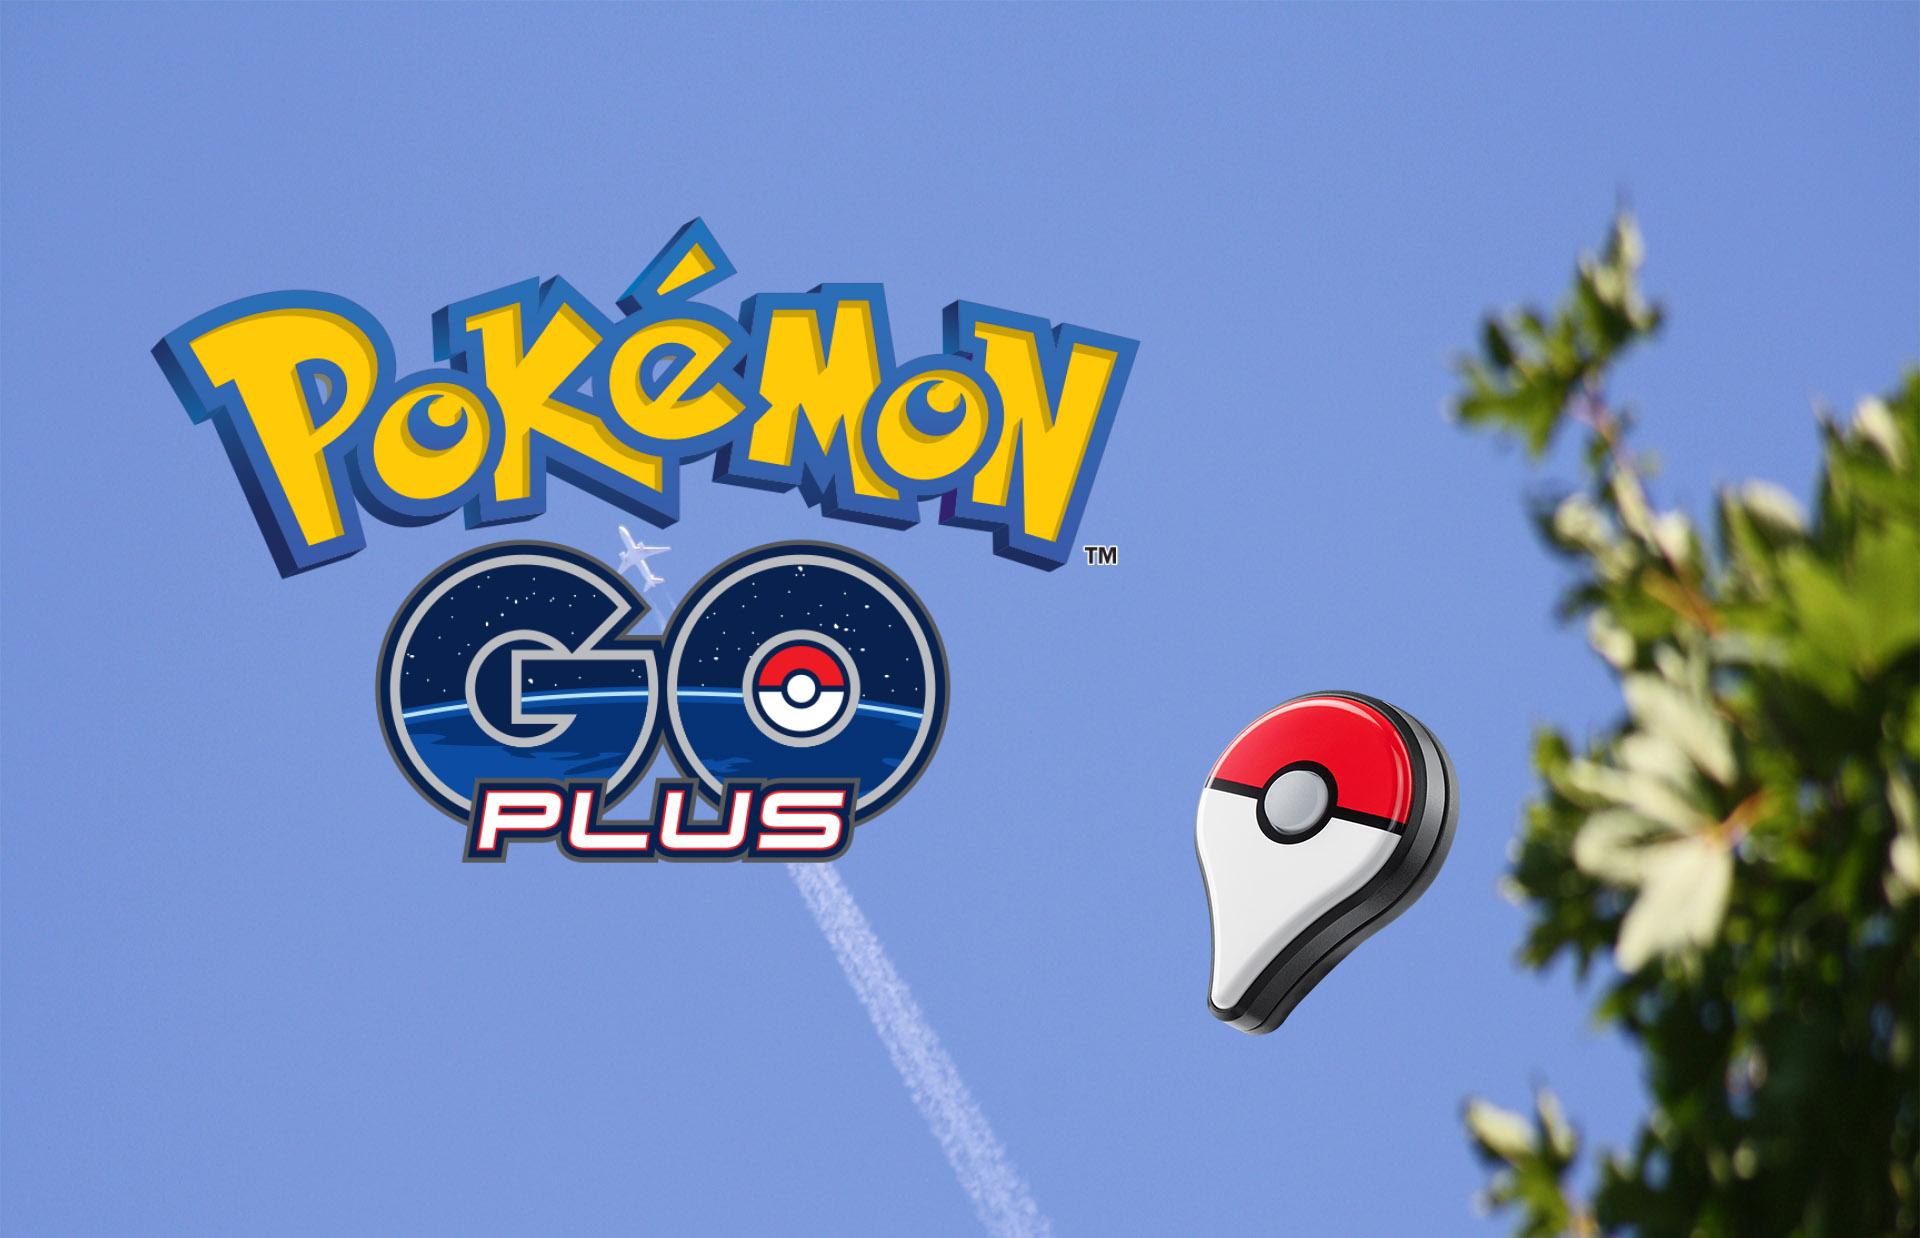 Pokémon GO Plus: Release erfolgt noch im September